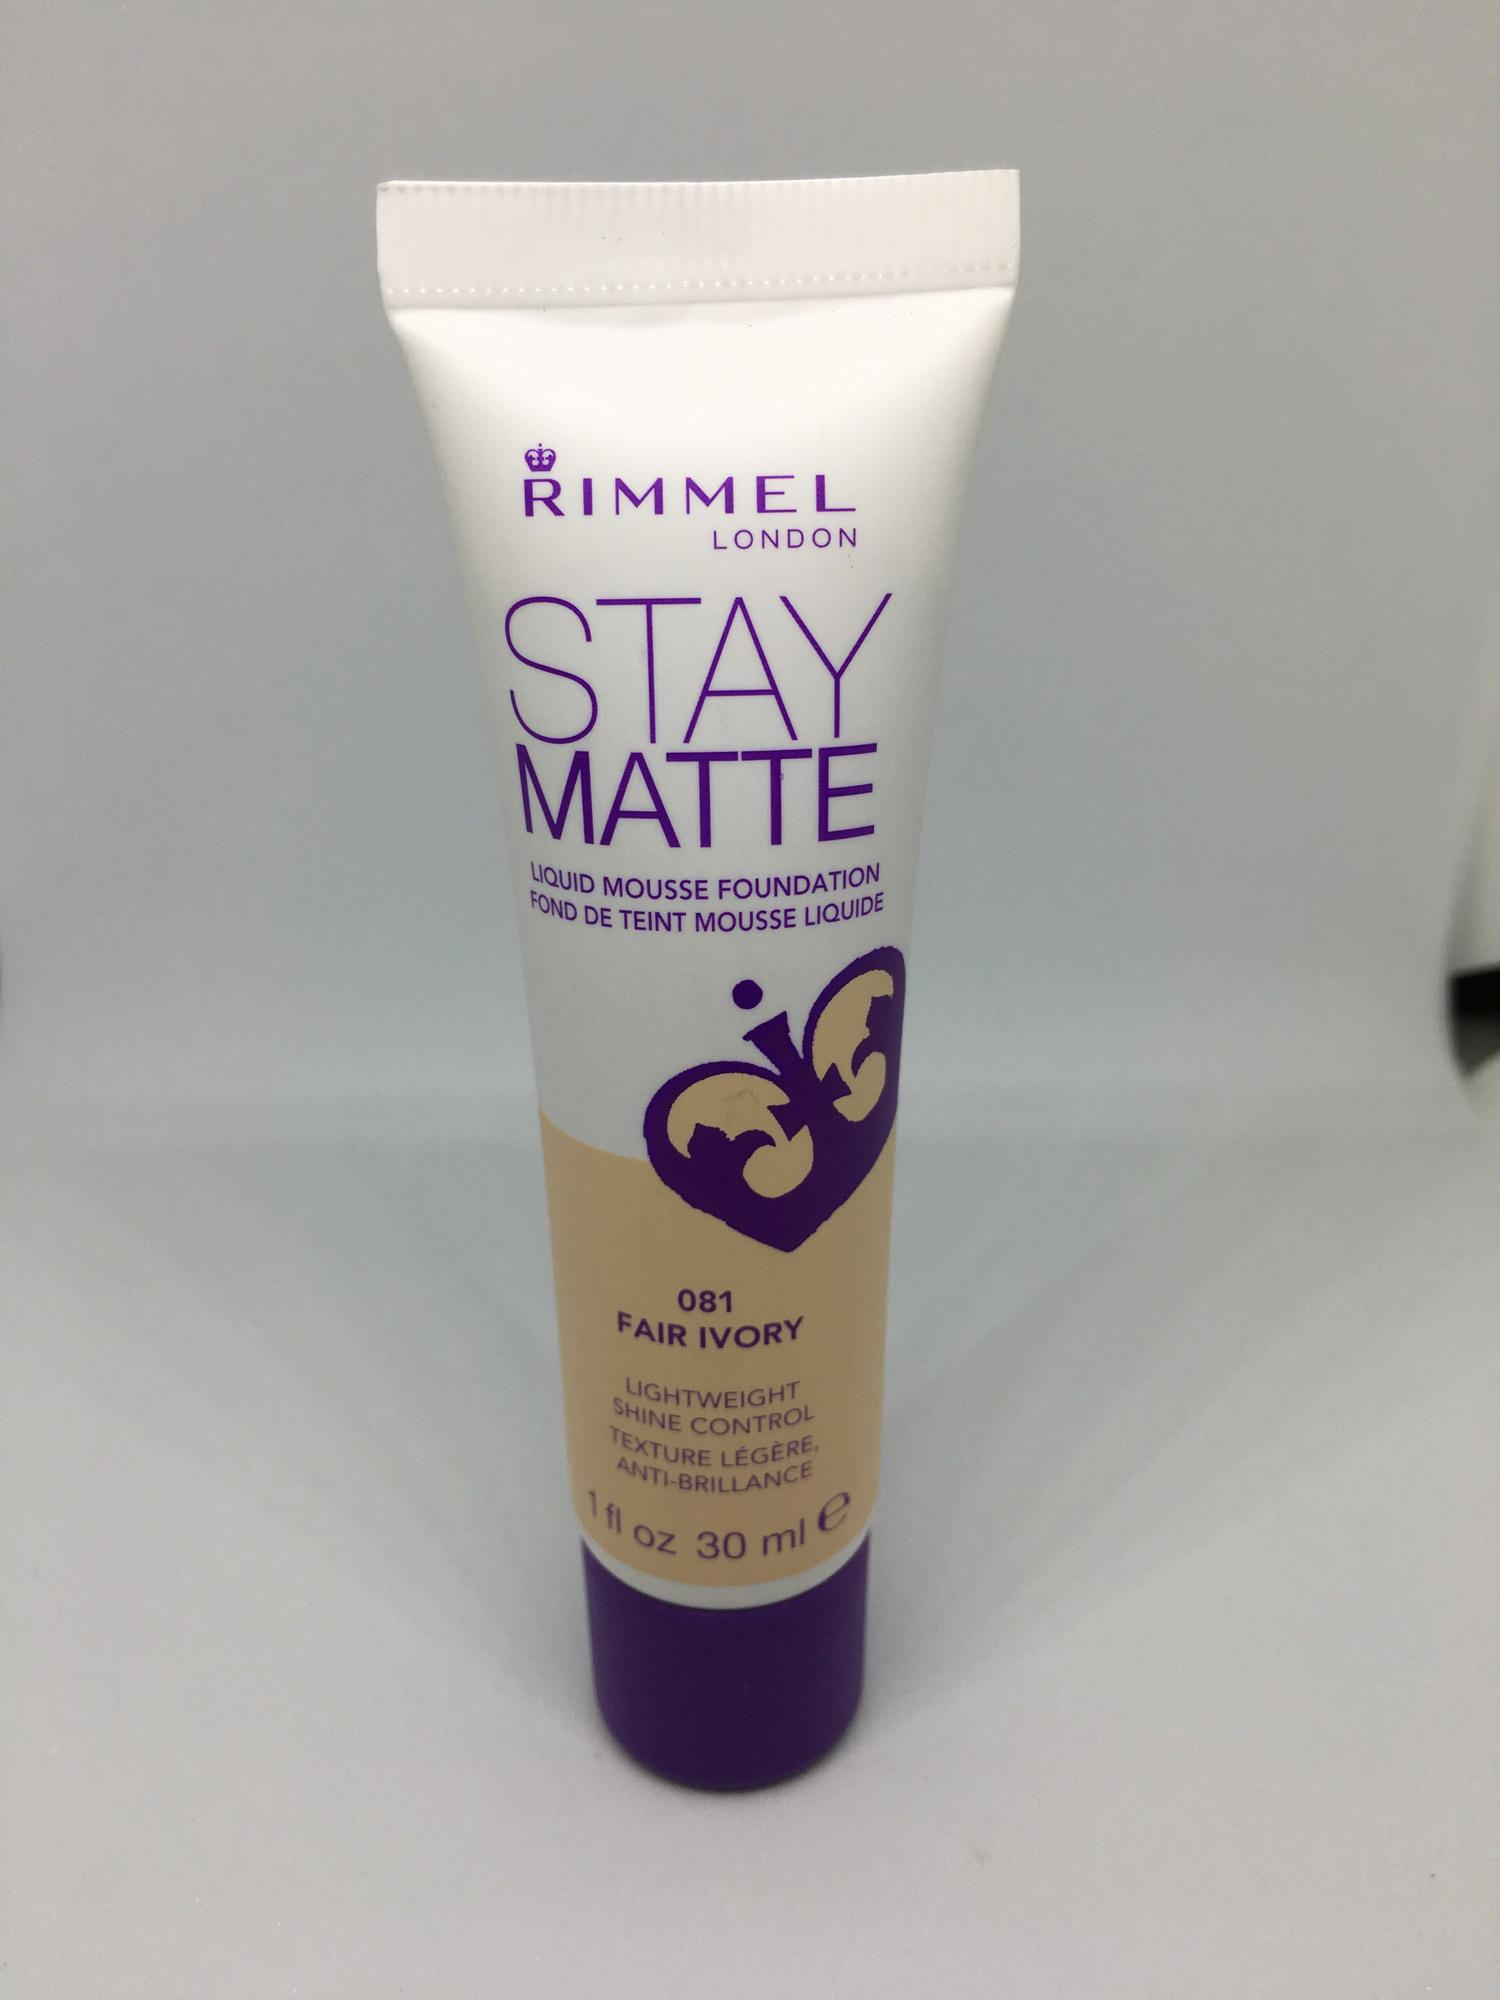 Rimmel Stay Matte Foundation (Fair Ivory)